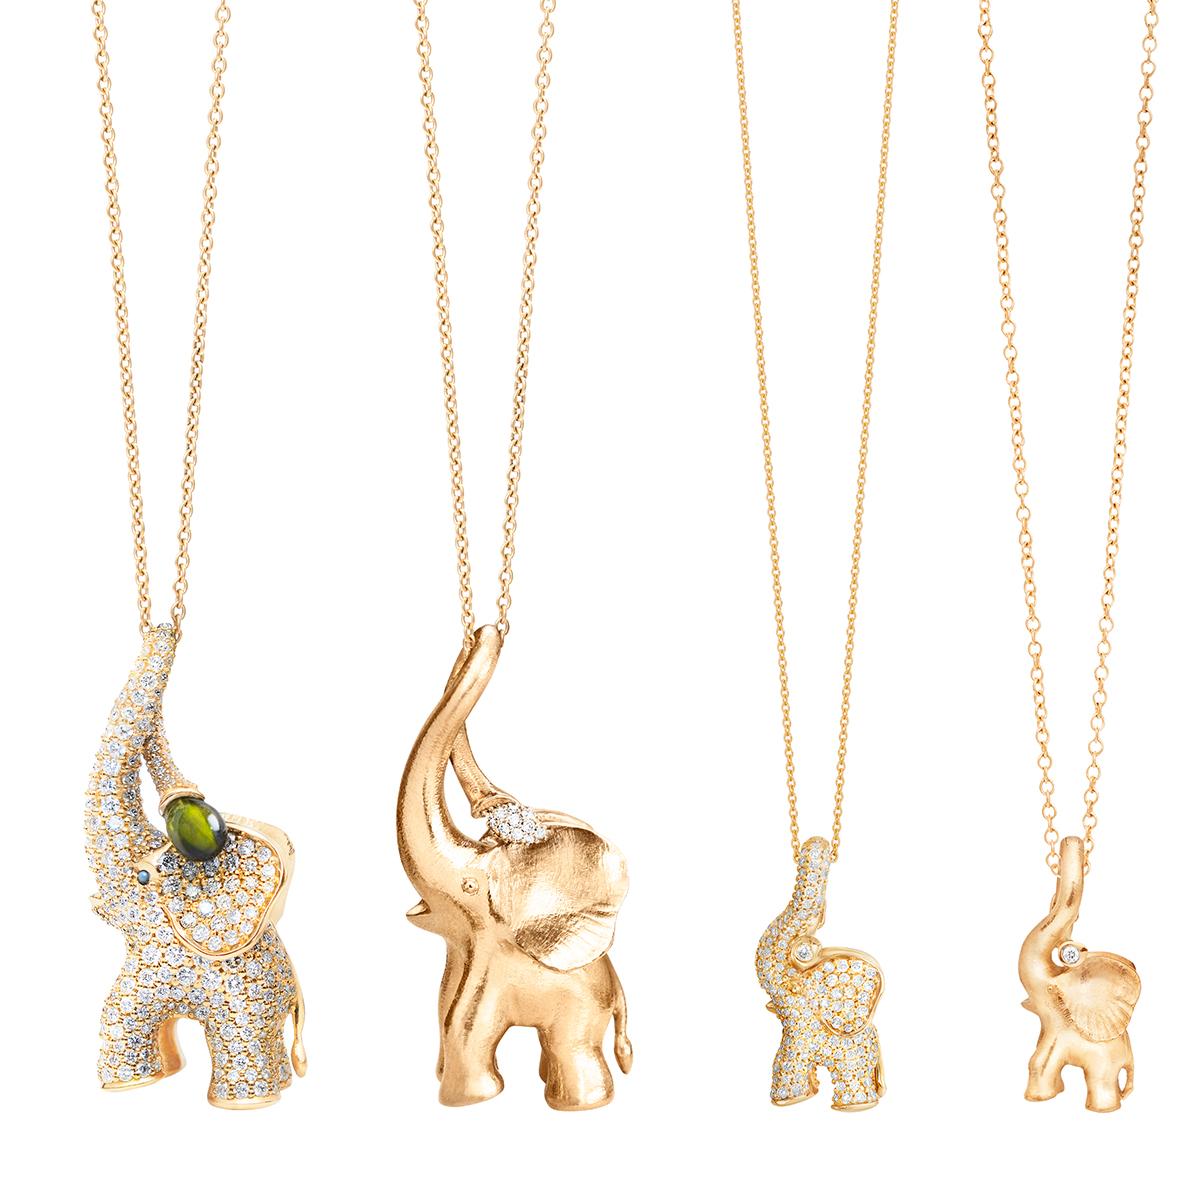 OLC_Collection_Elephant_1.jpg